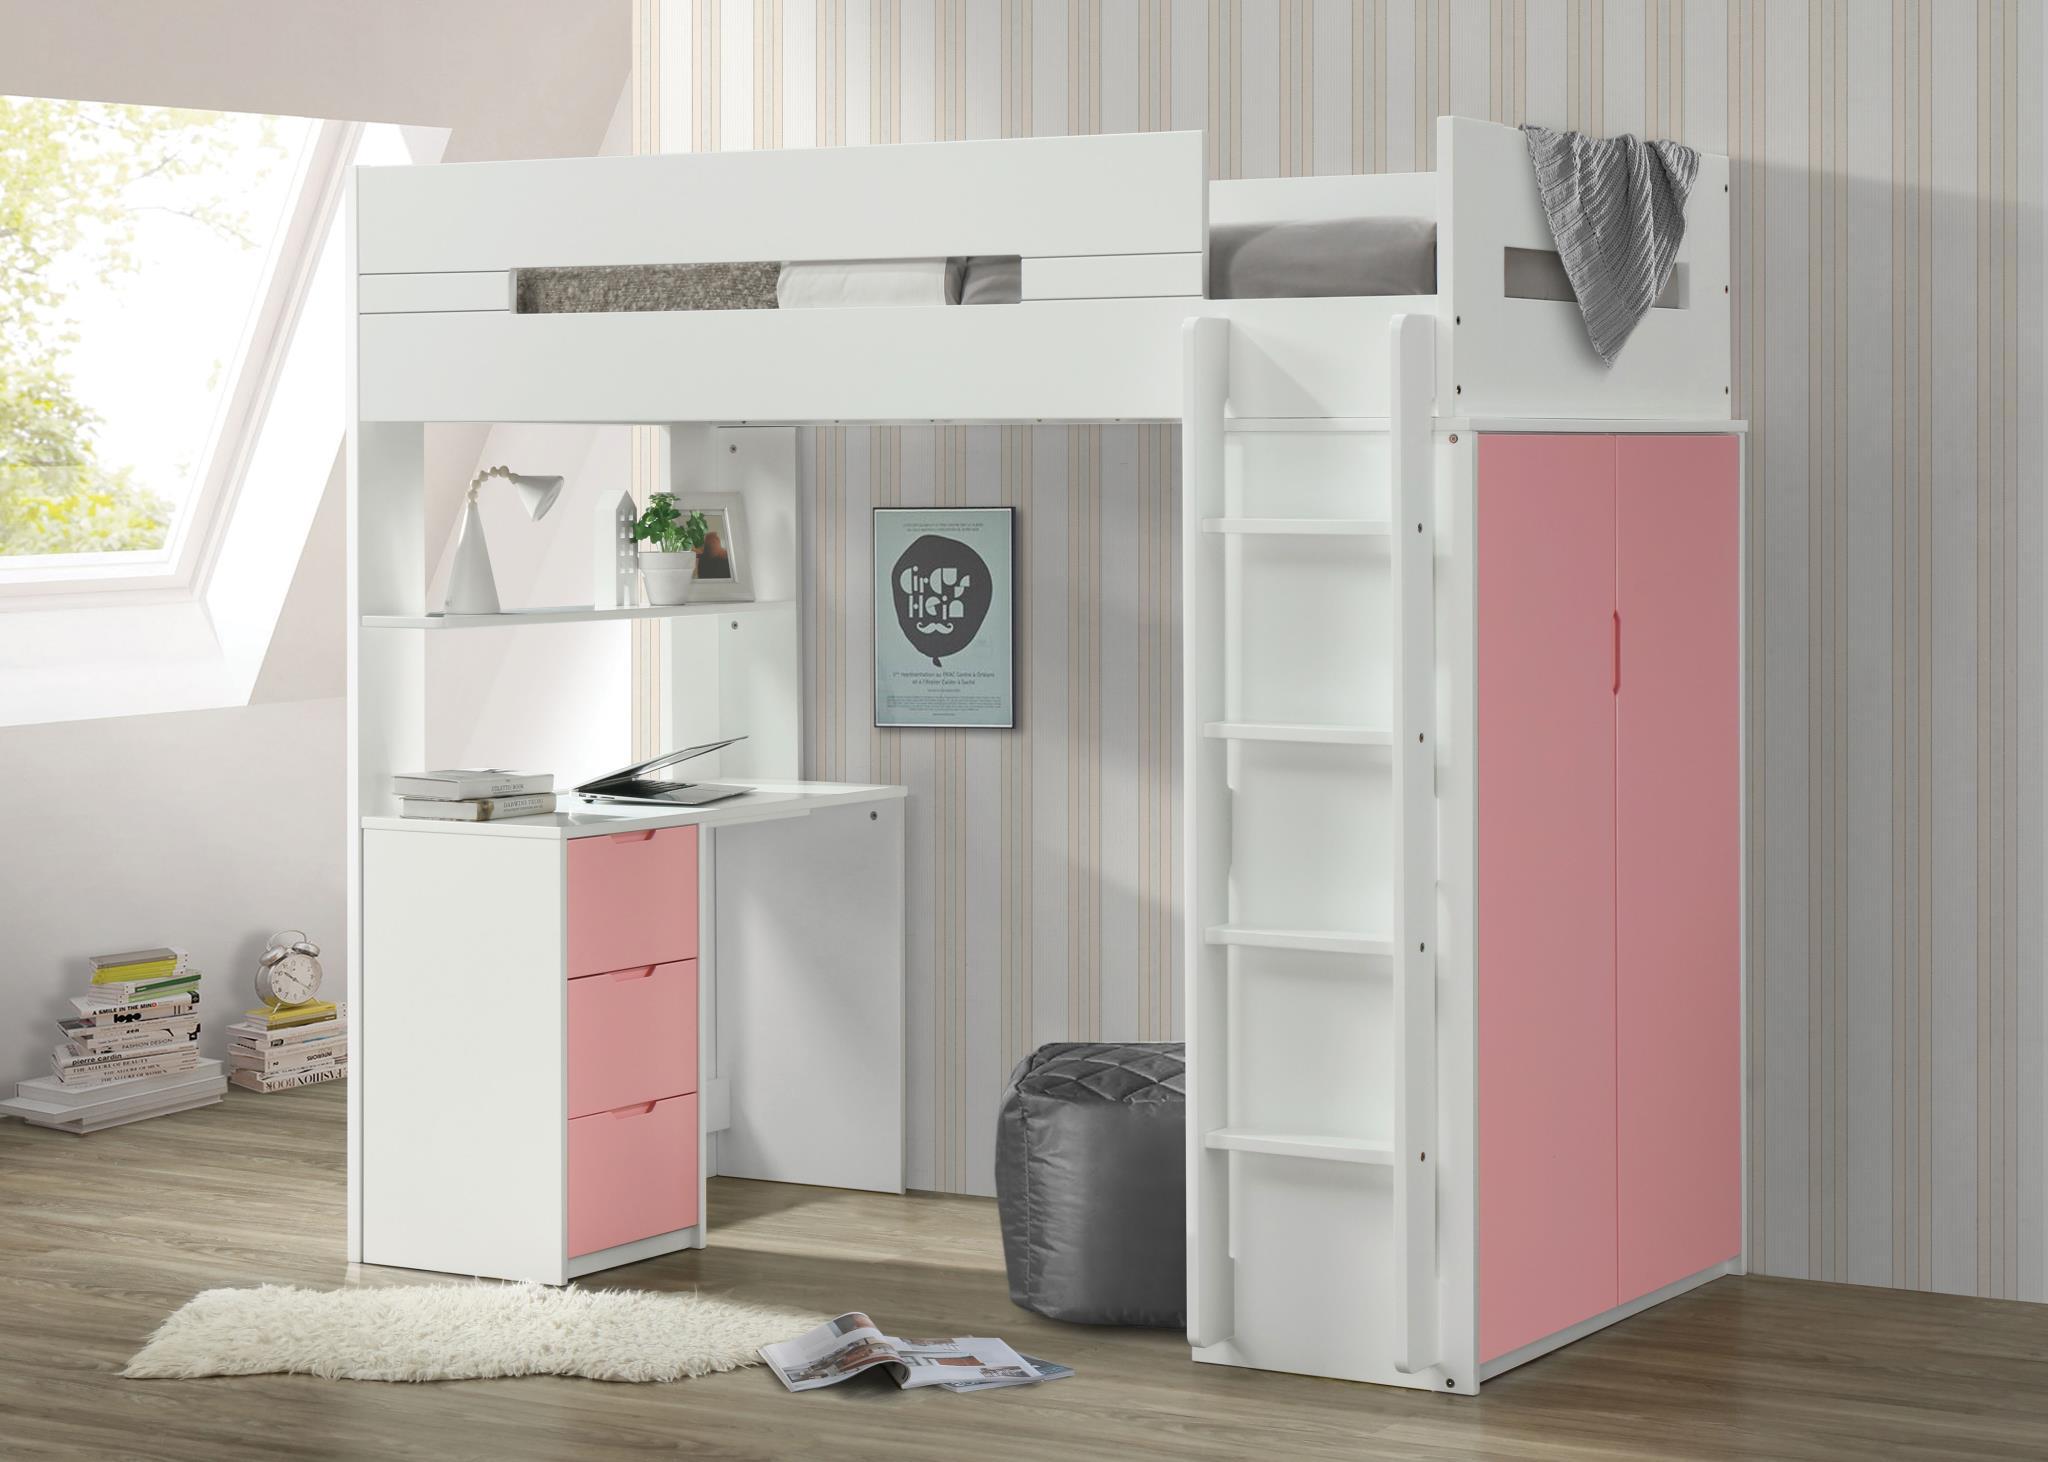 Pink & White Loft Bed